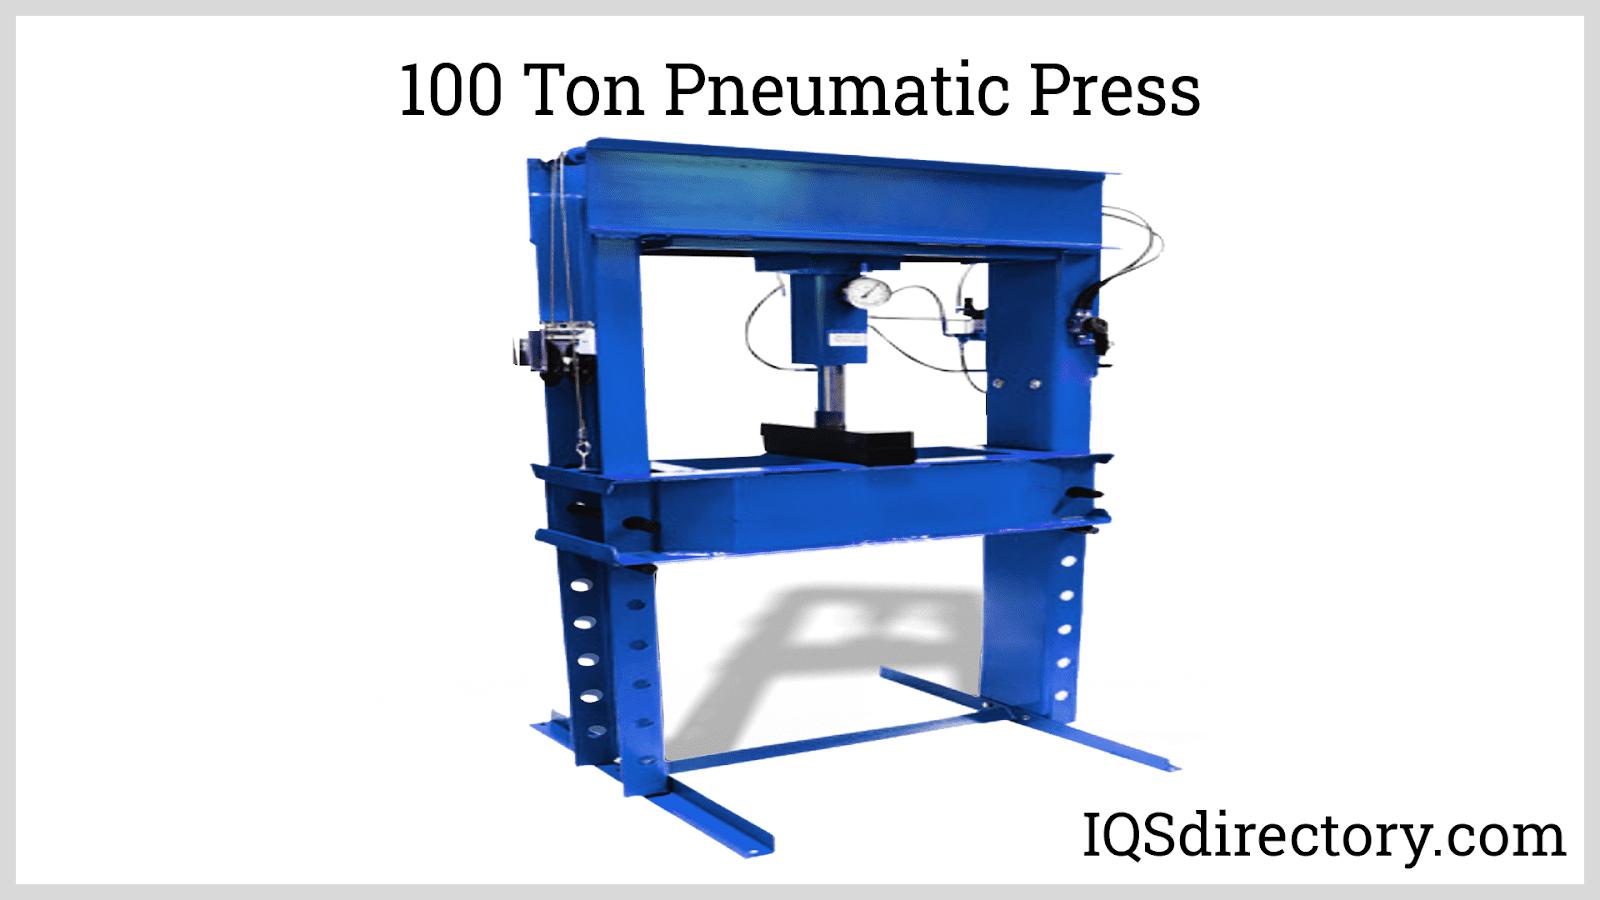 100 Ton Pneumatic Press